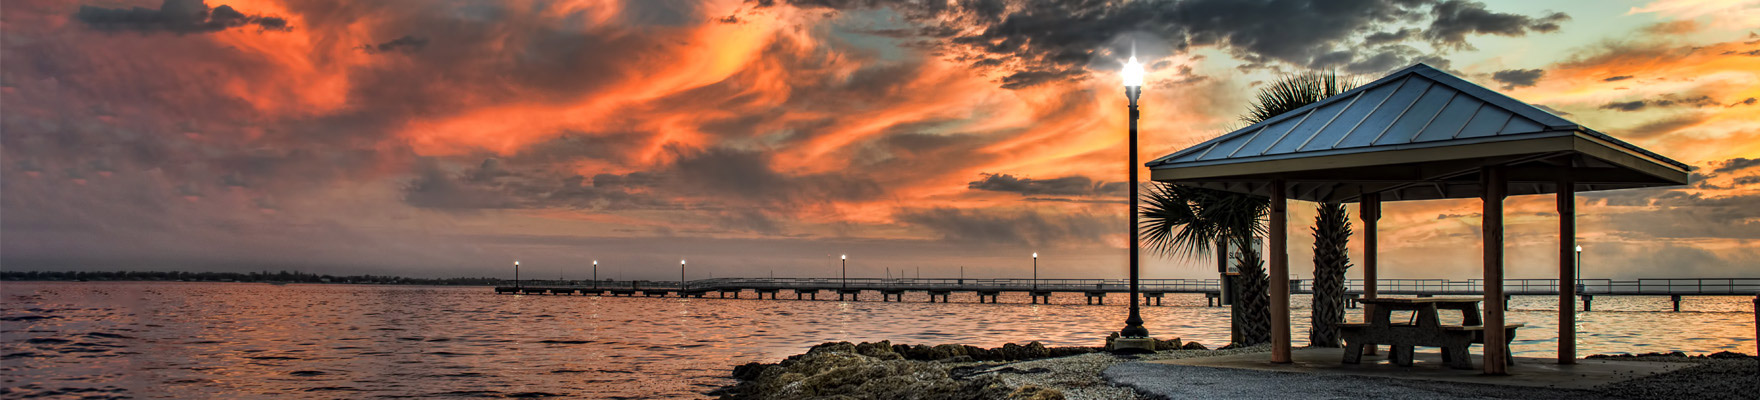 Punta Gorda Florida, Sunset over the Peace River